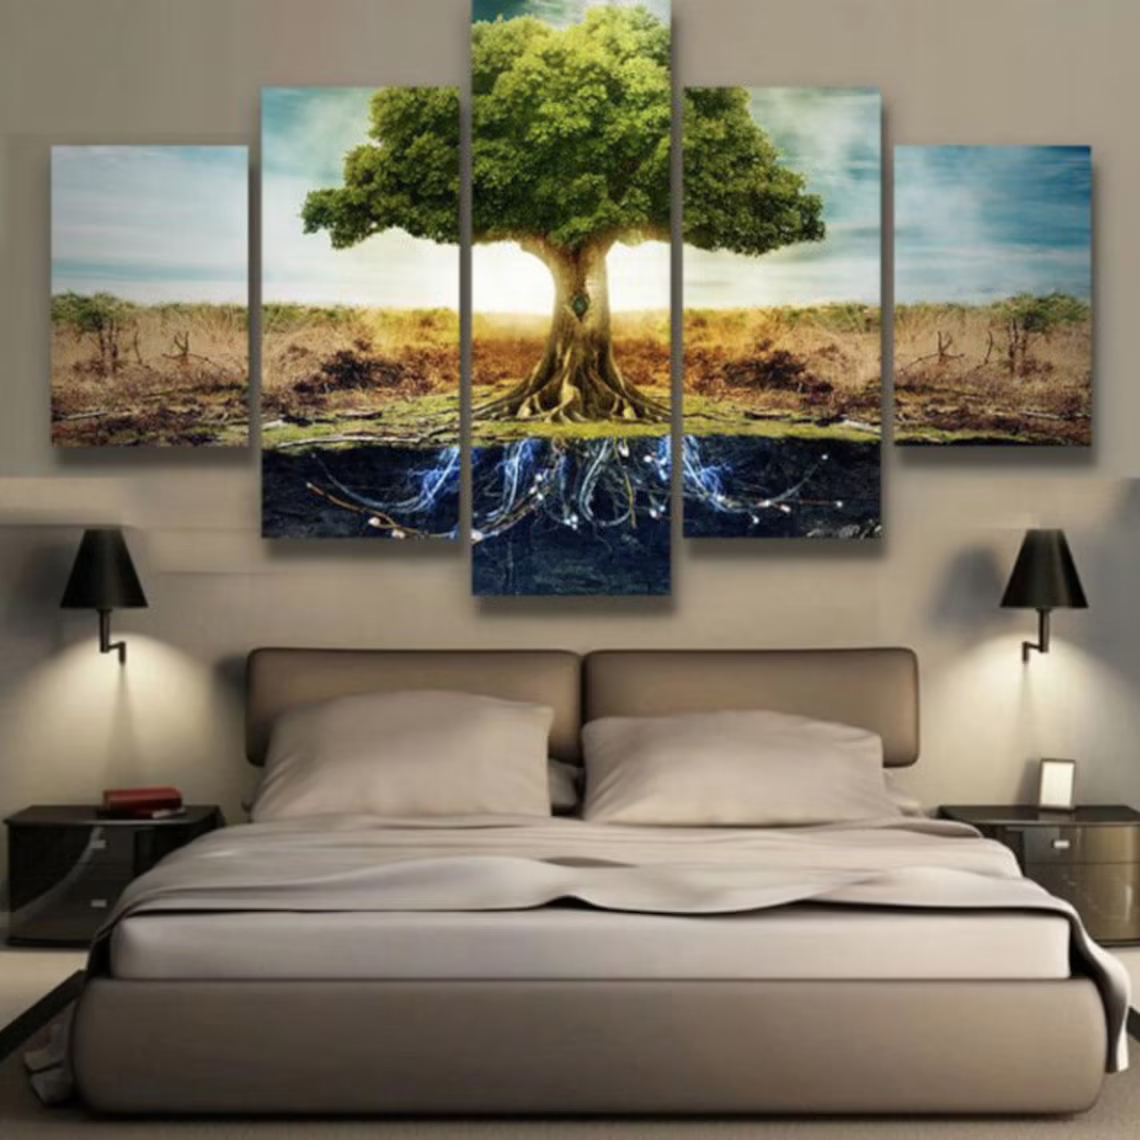 Tree of Life Landscape 5 Piece Five Panel Canvas